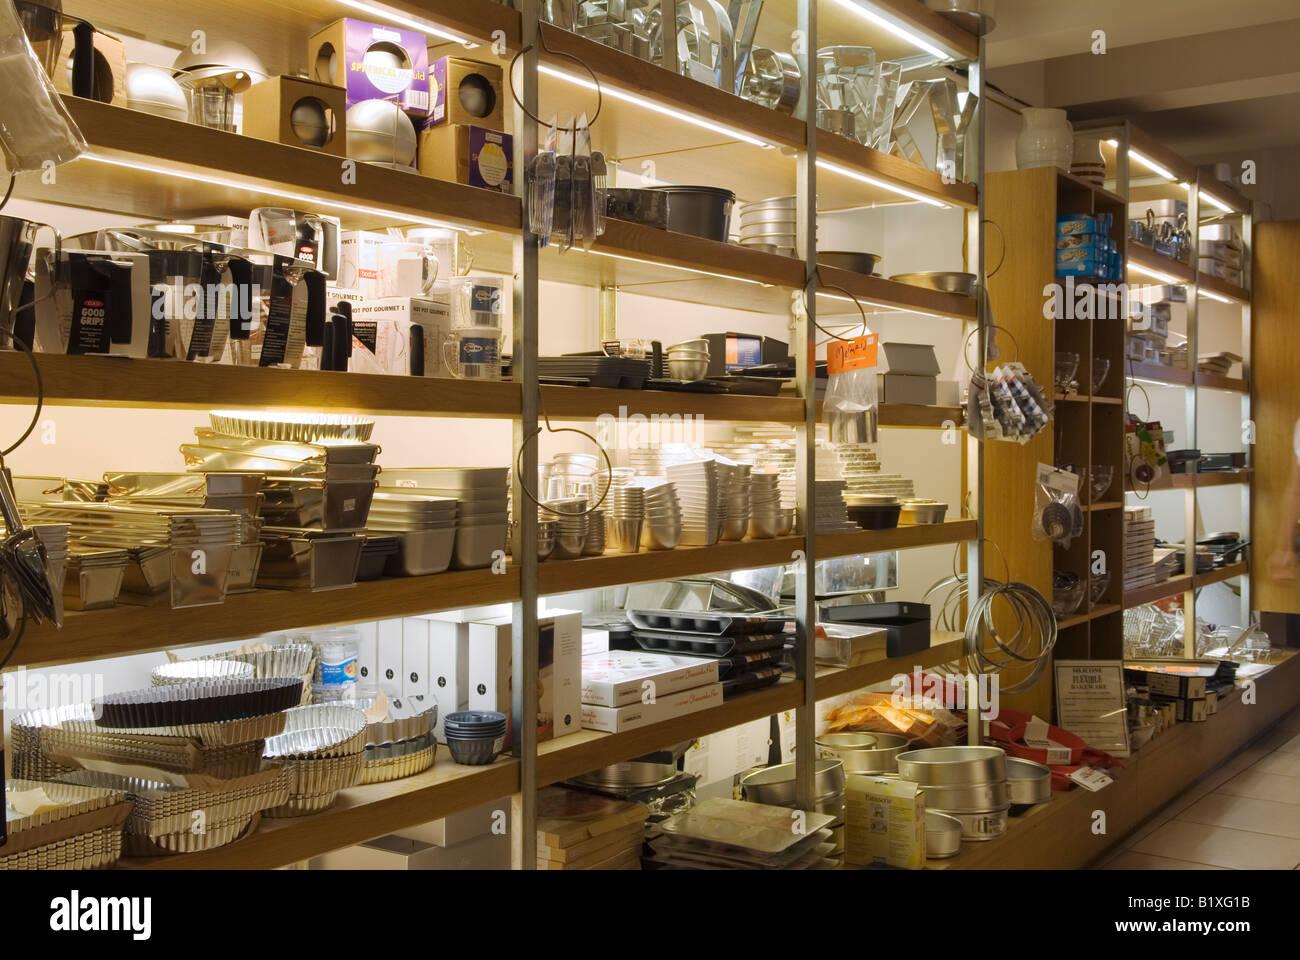 Interior Divertimenti Kitchen Equipment Shop Maryledbone High Street.  London   Stock Photo